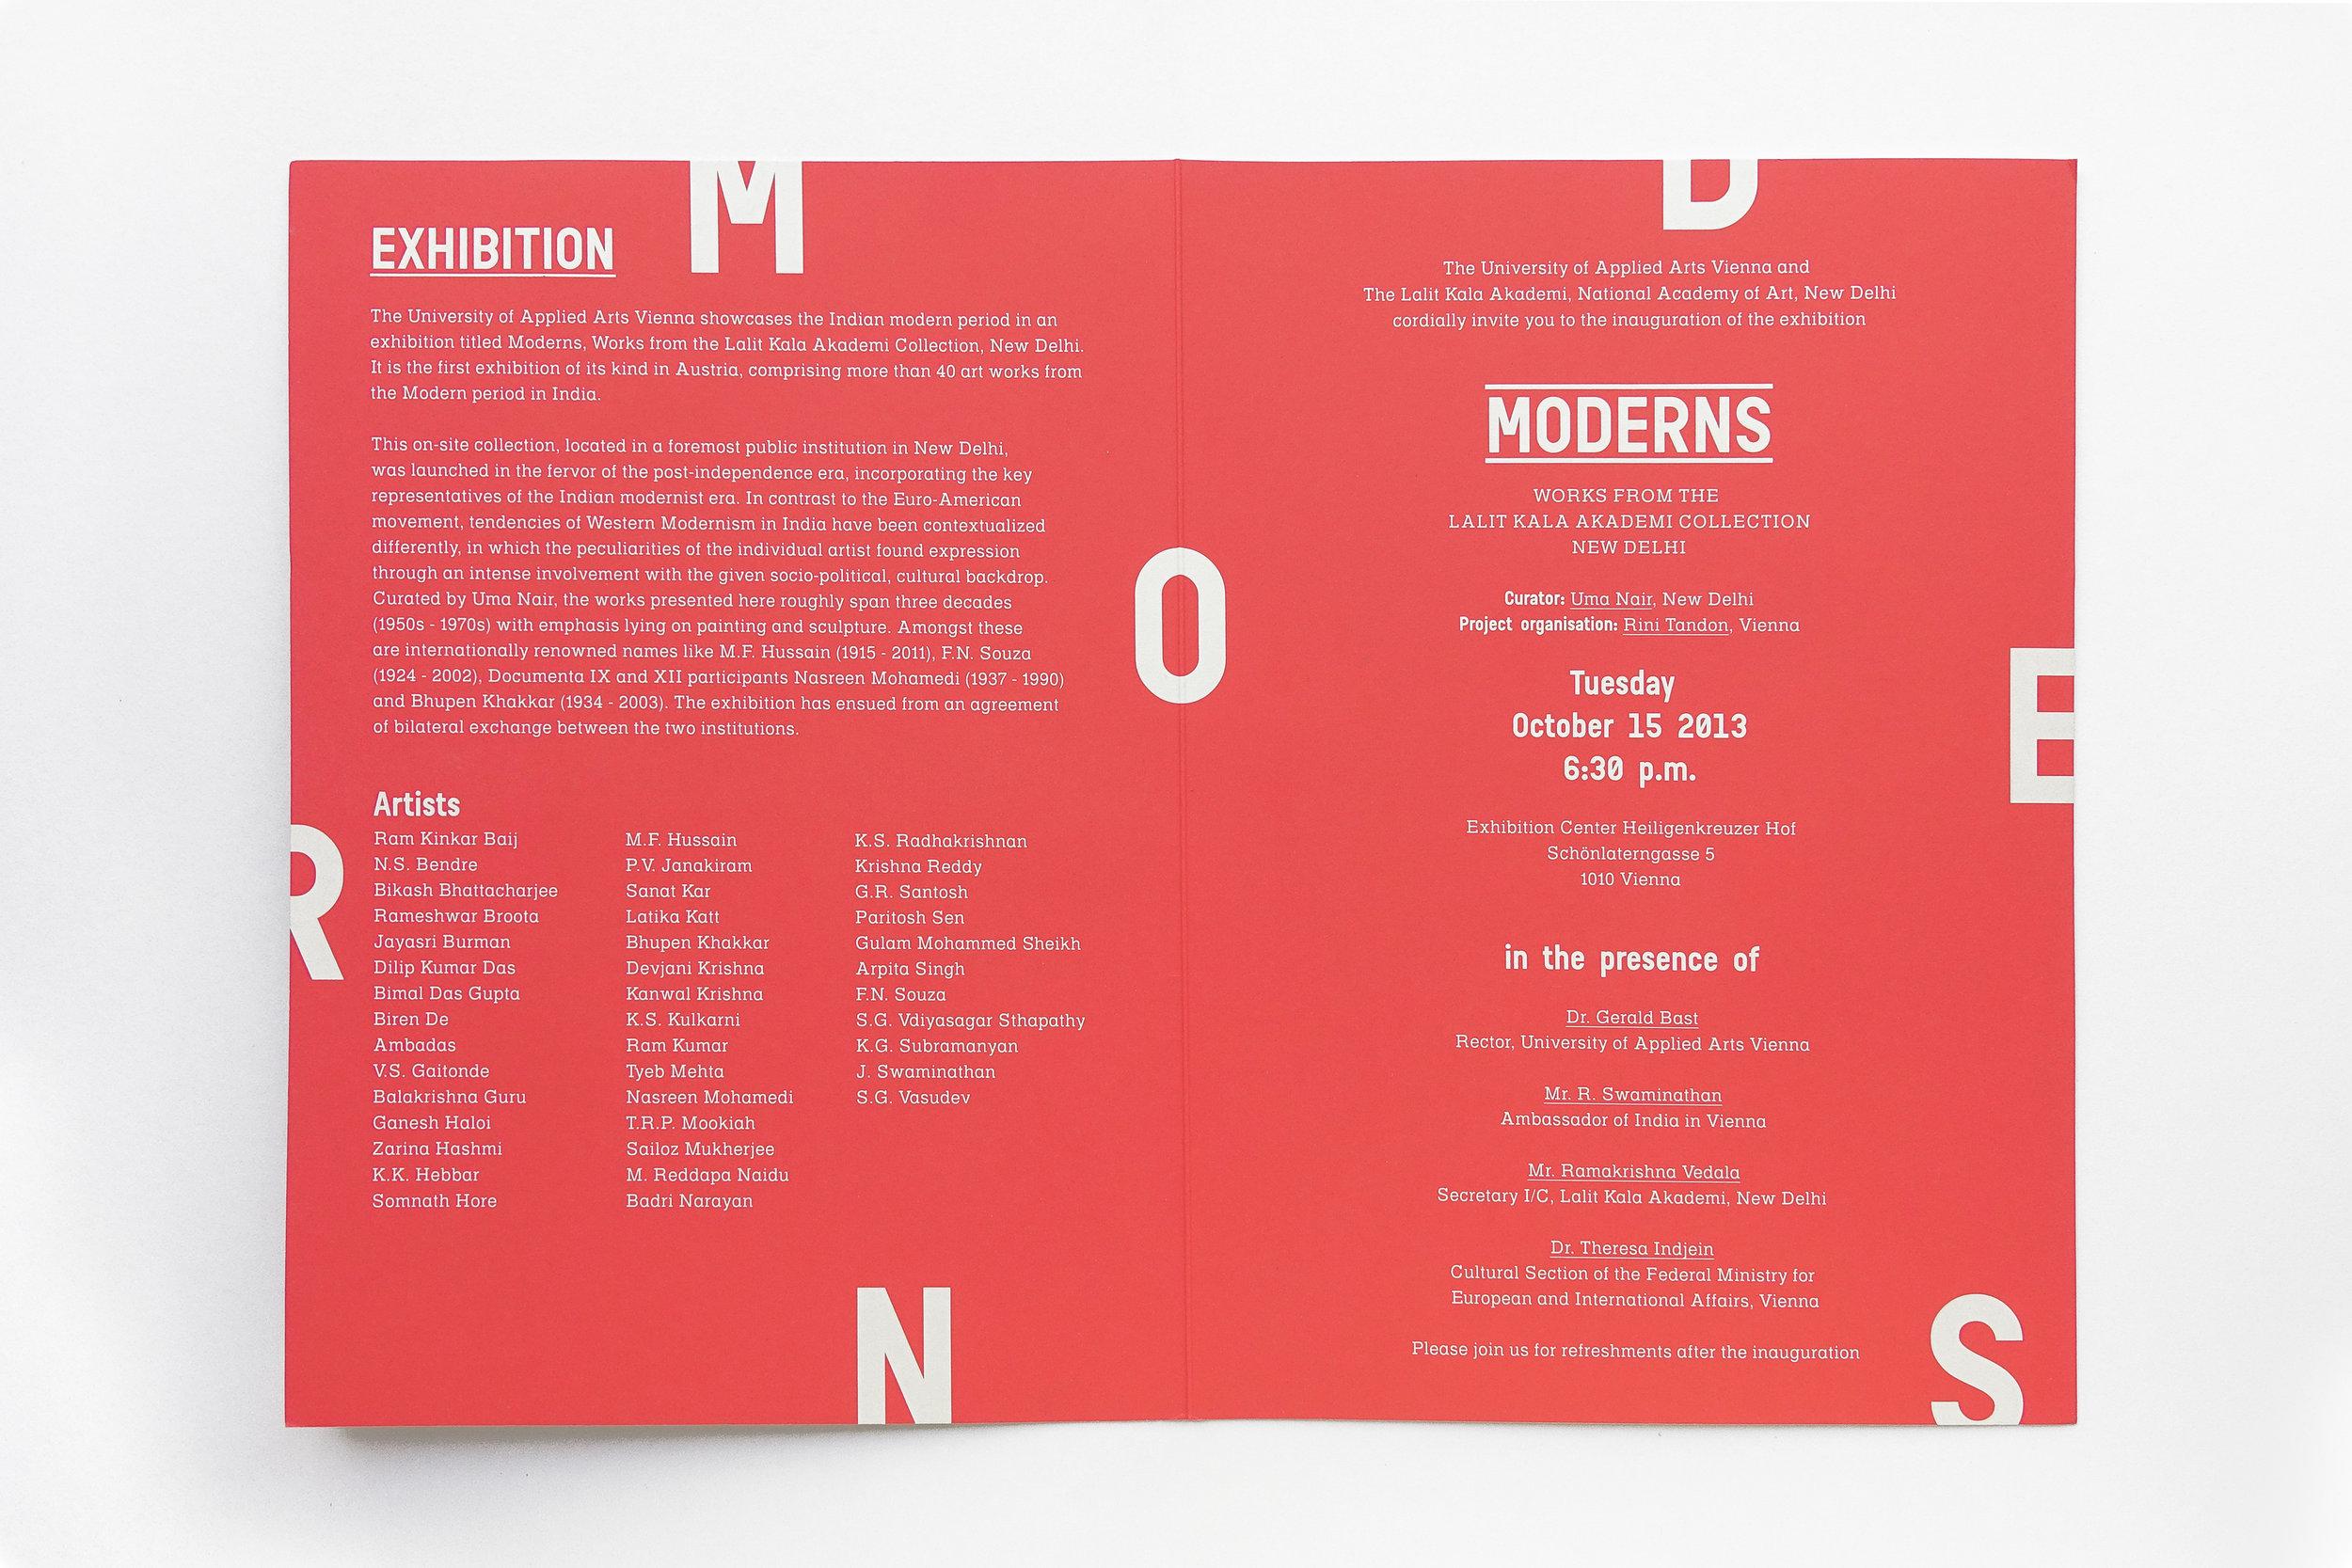 moderns_1-1-2.jpg